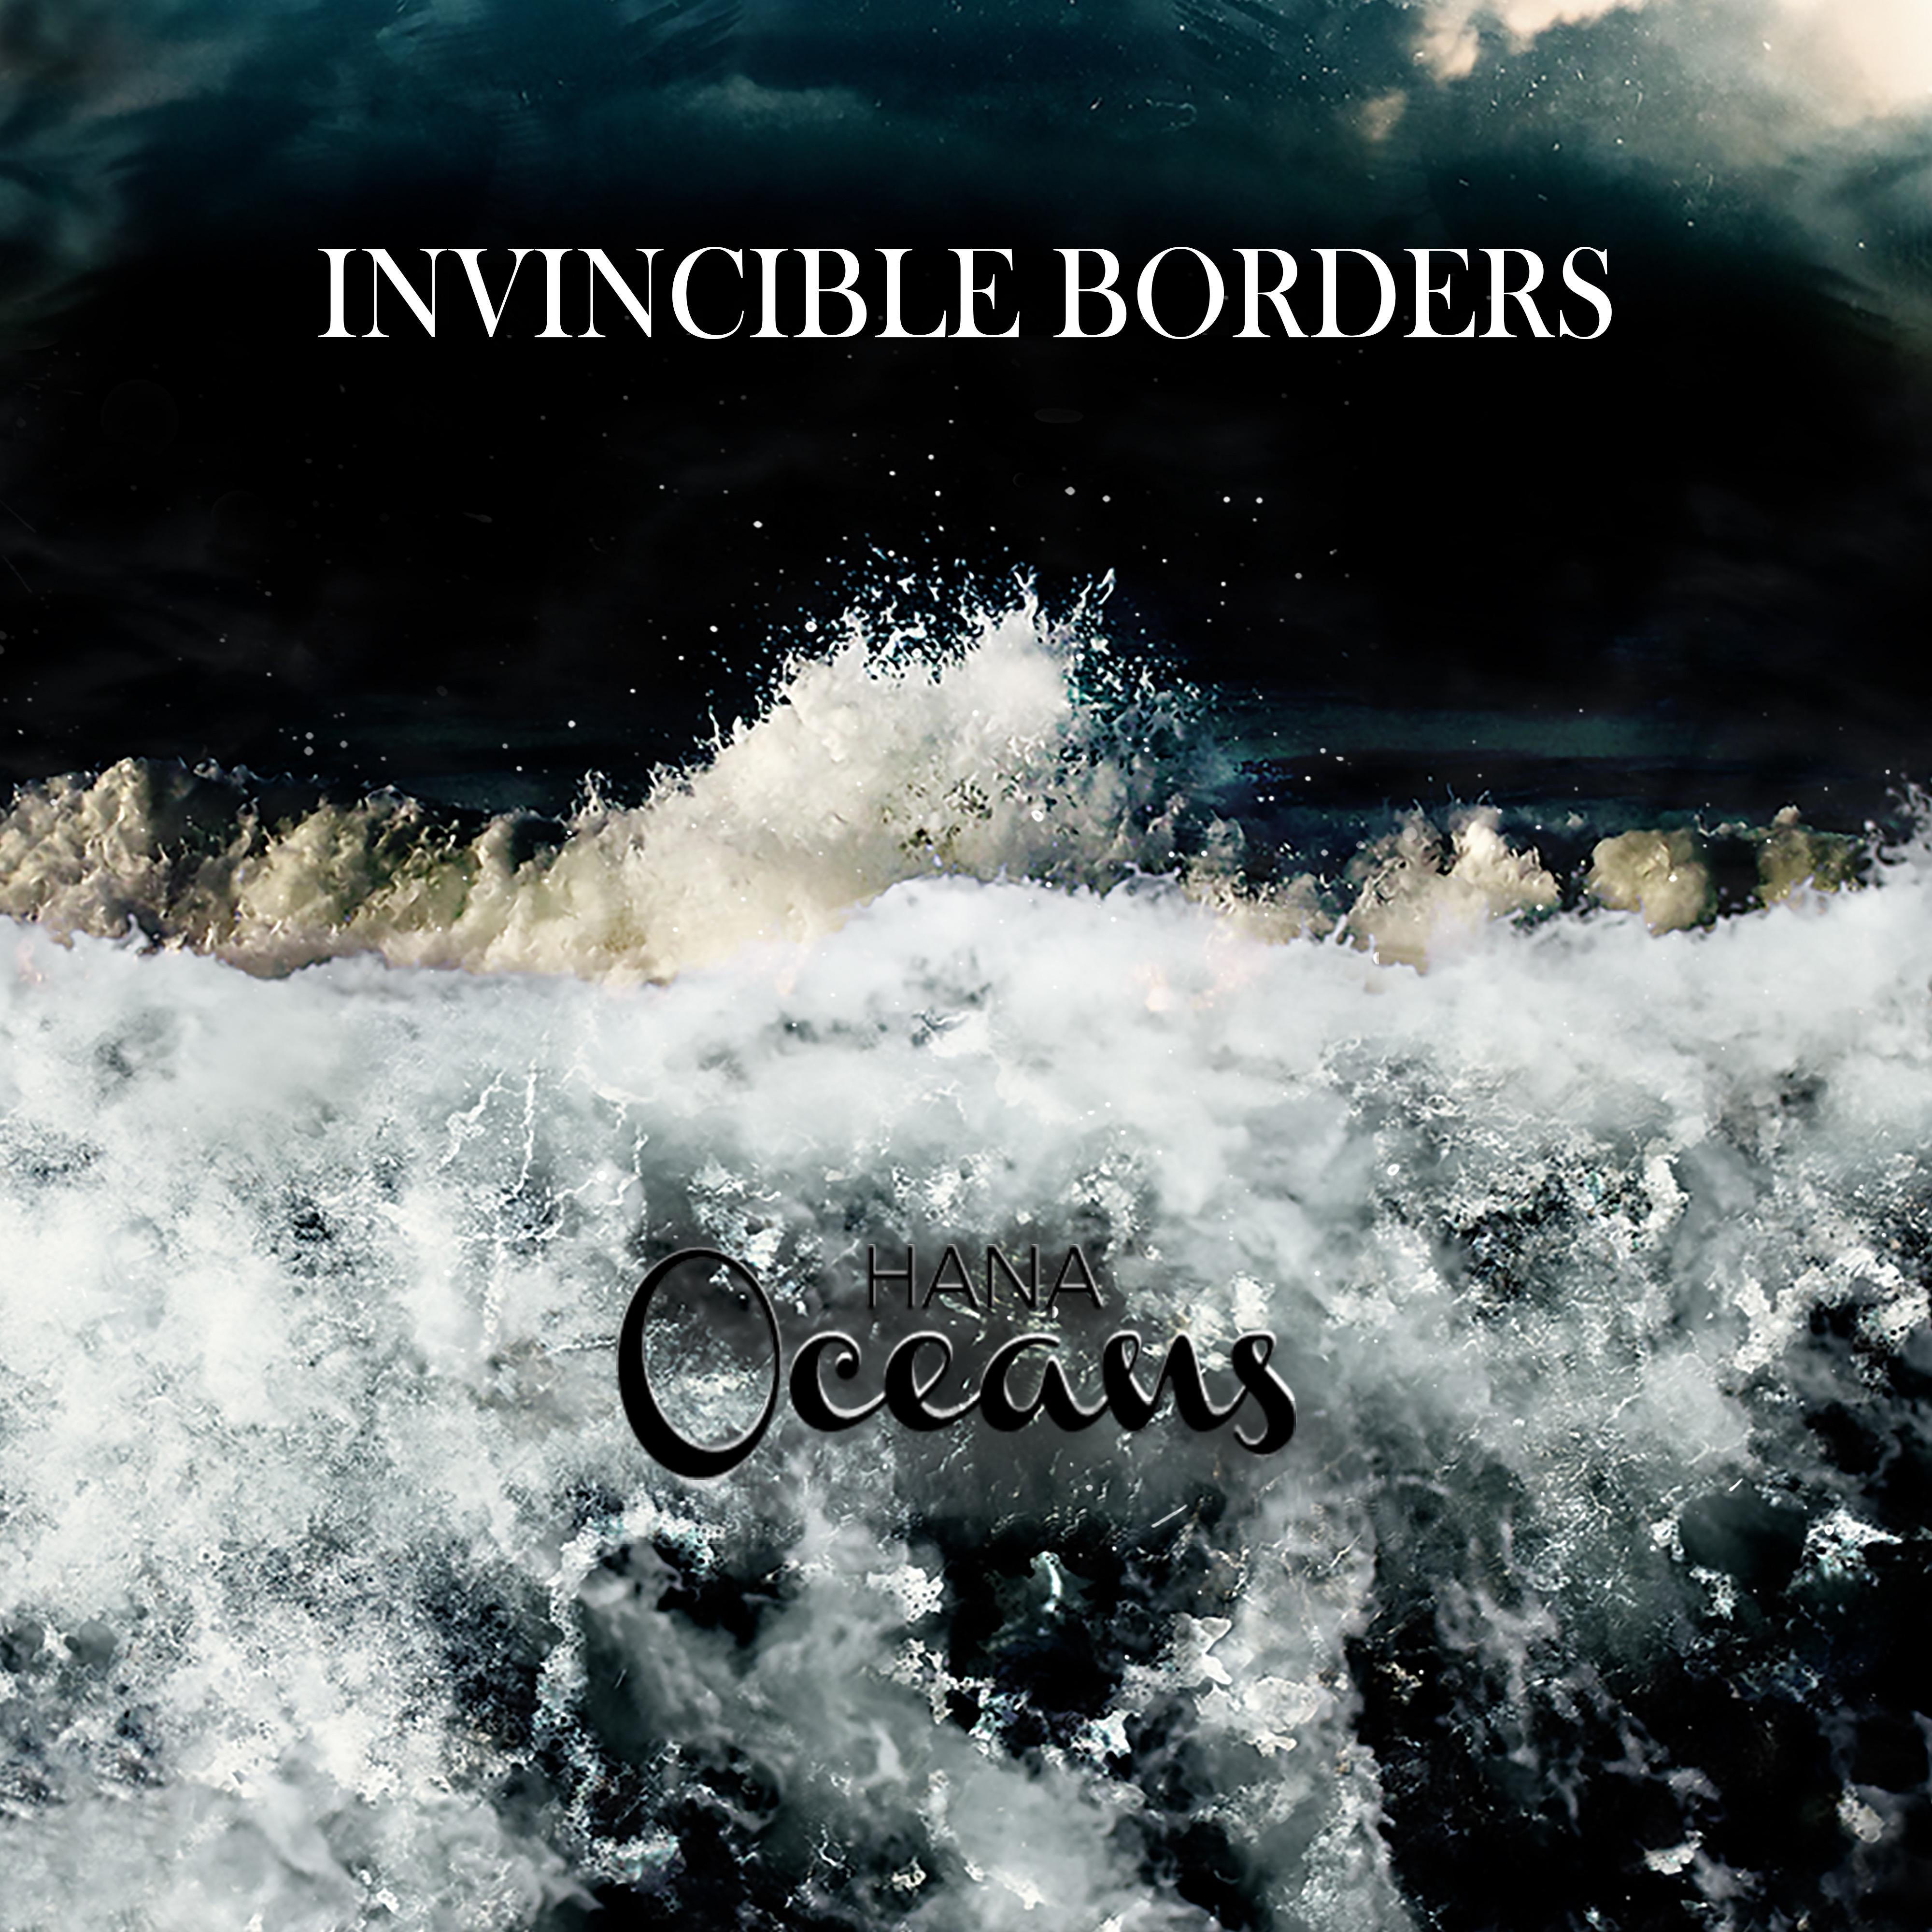 Hana Oceans – Invincible Borders